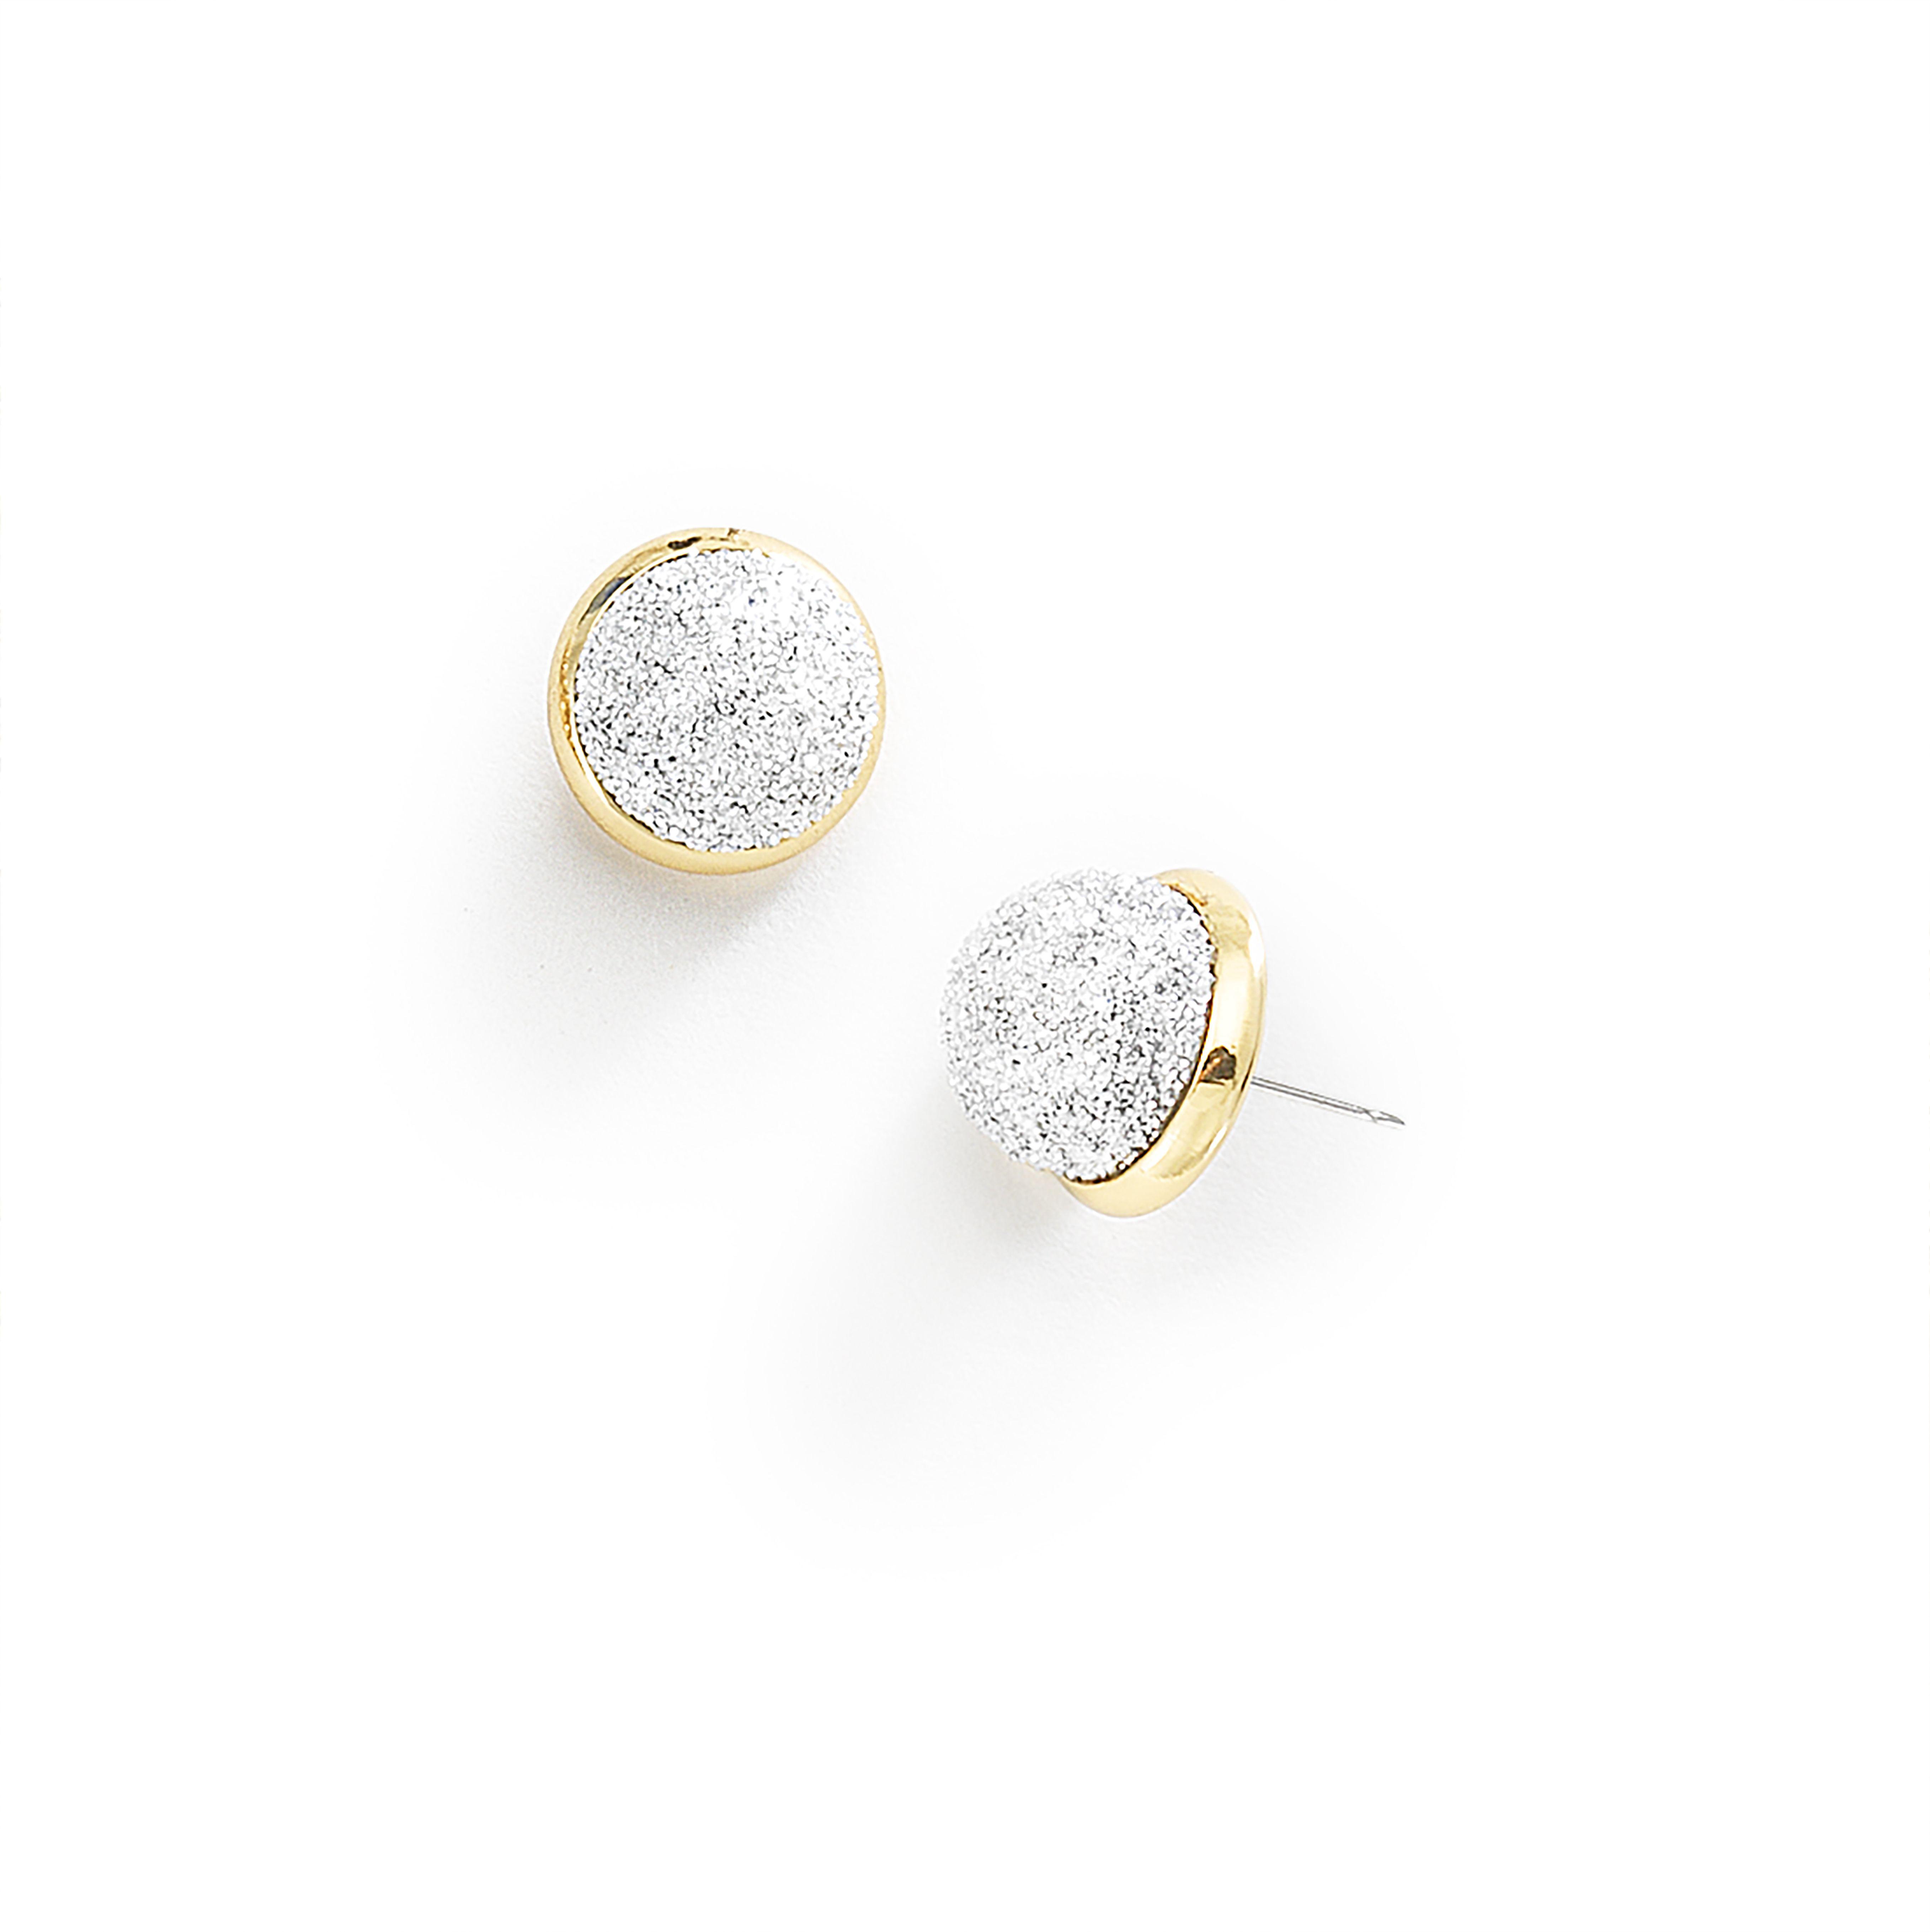 la mejor actitud 16ed4 3bfda Pin en NICE jewelry and accessories